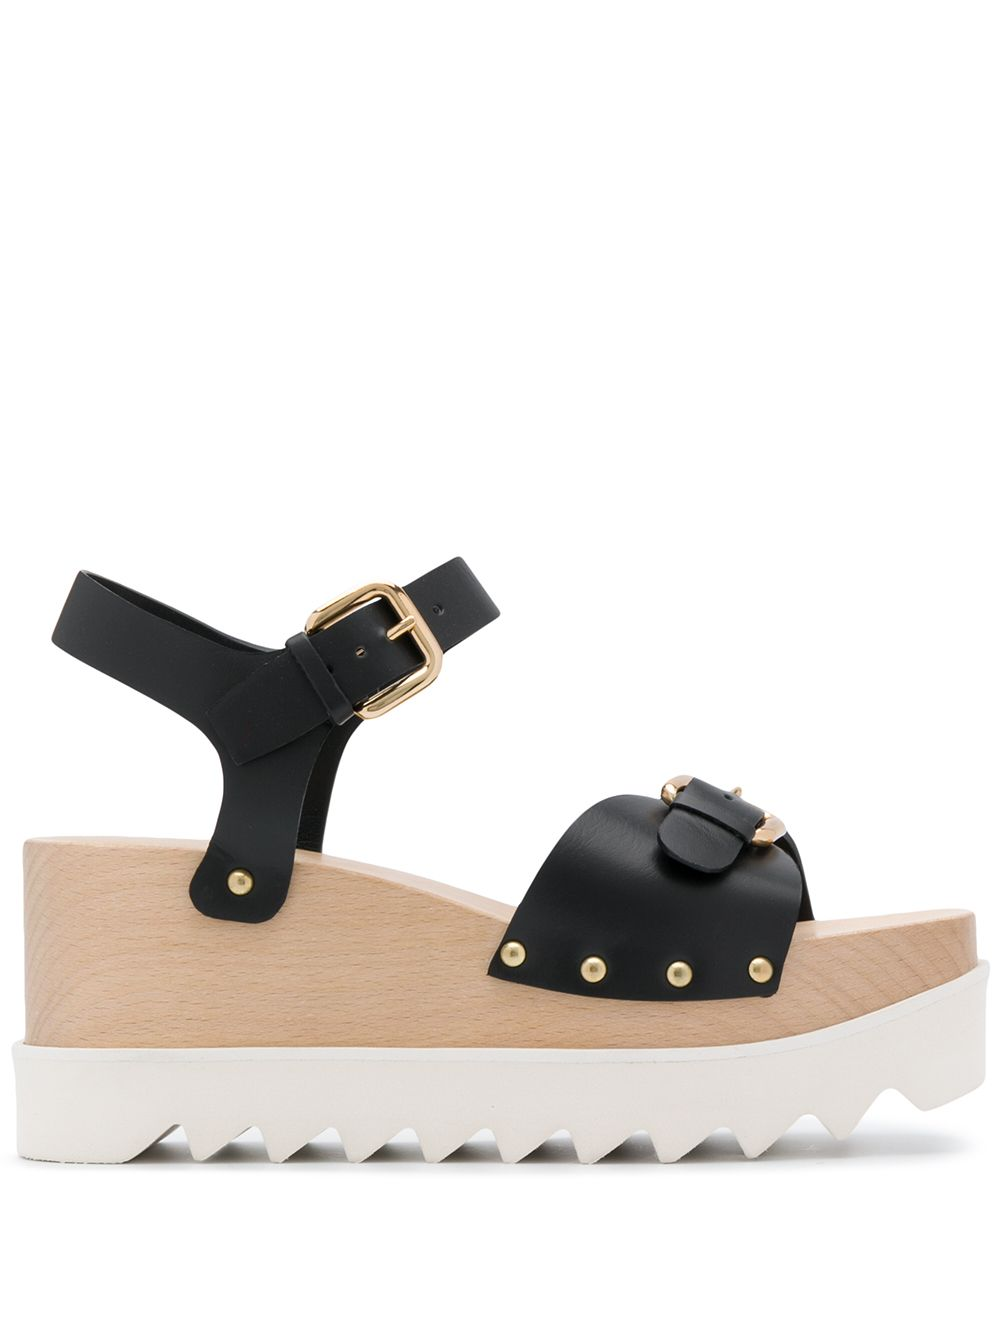 Elyse Sandals